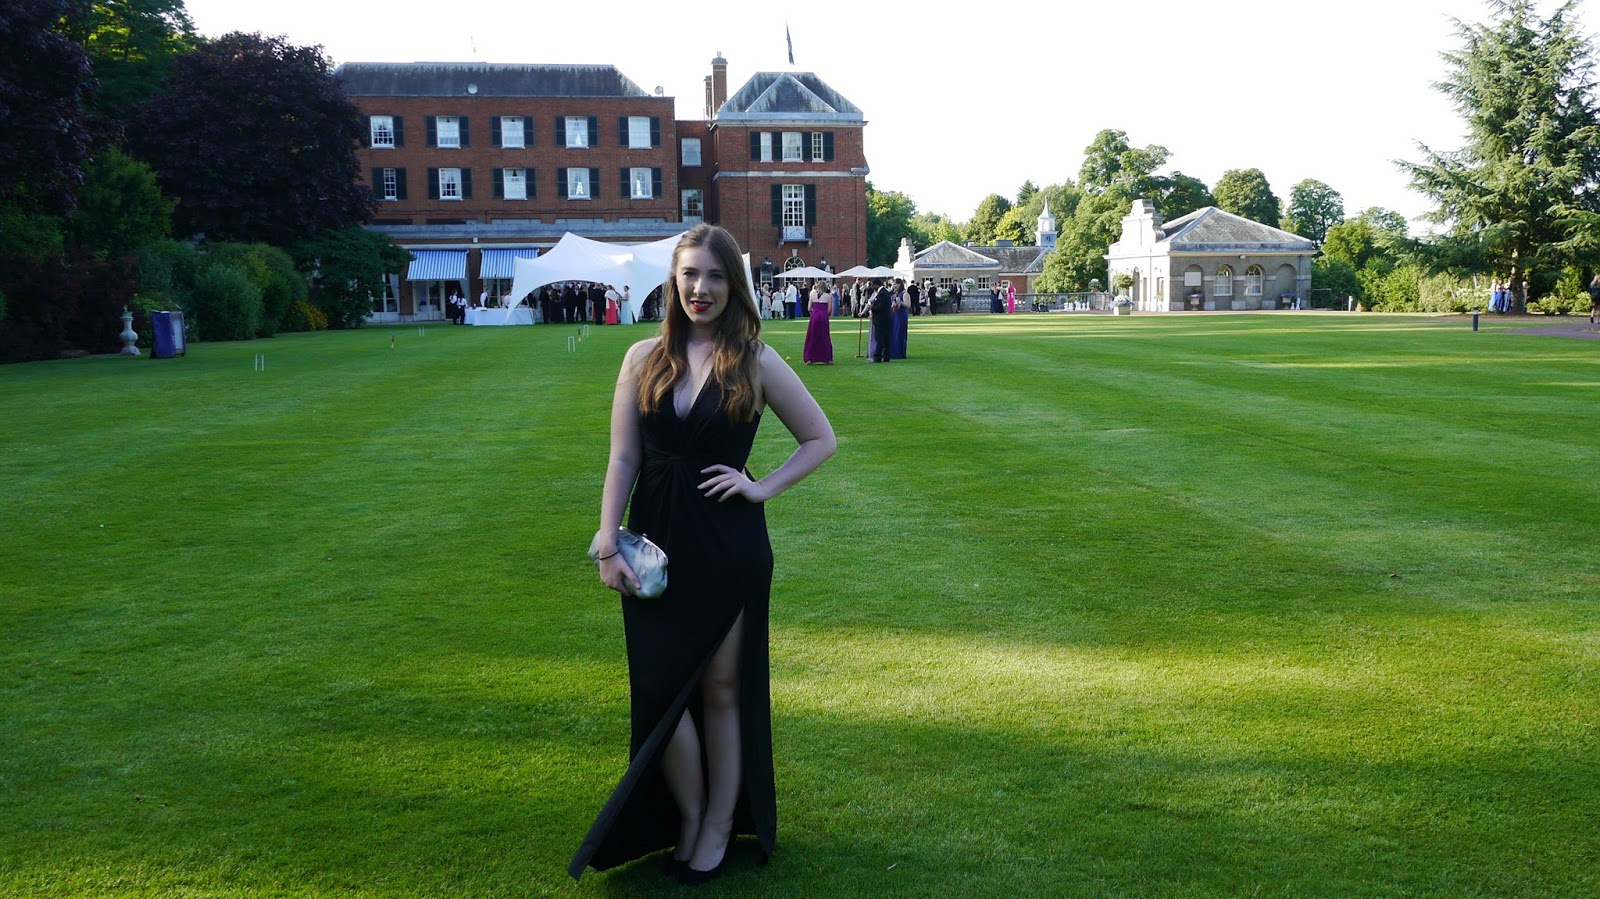 Royal Automobile Club Woodcote Park summer ball